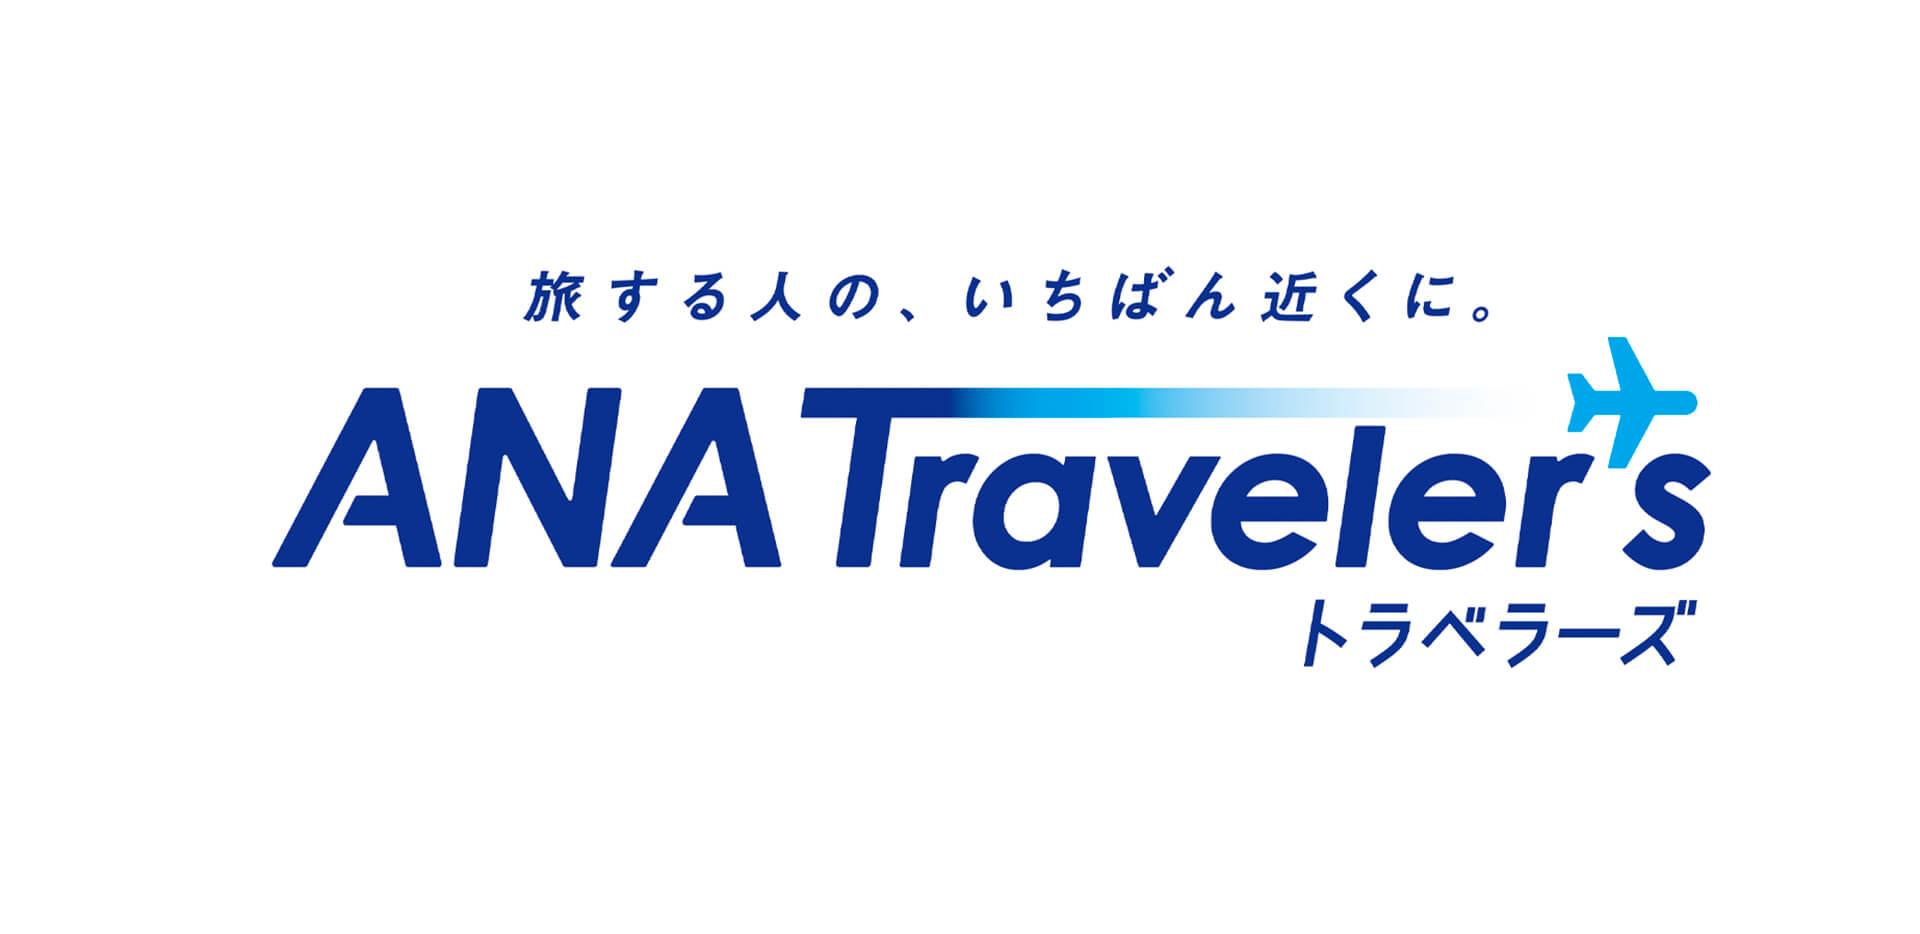 ANAトラベラーズ オンラインツアー